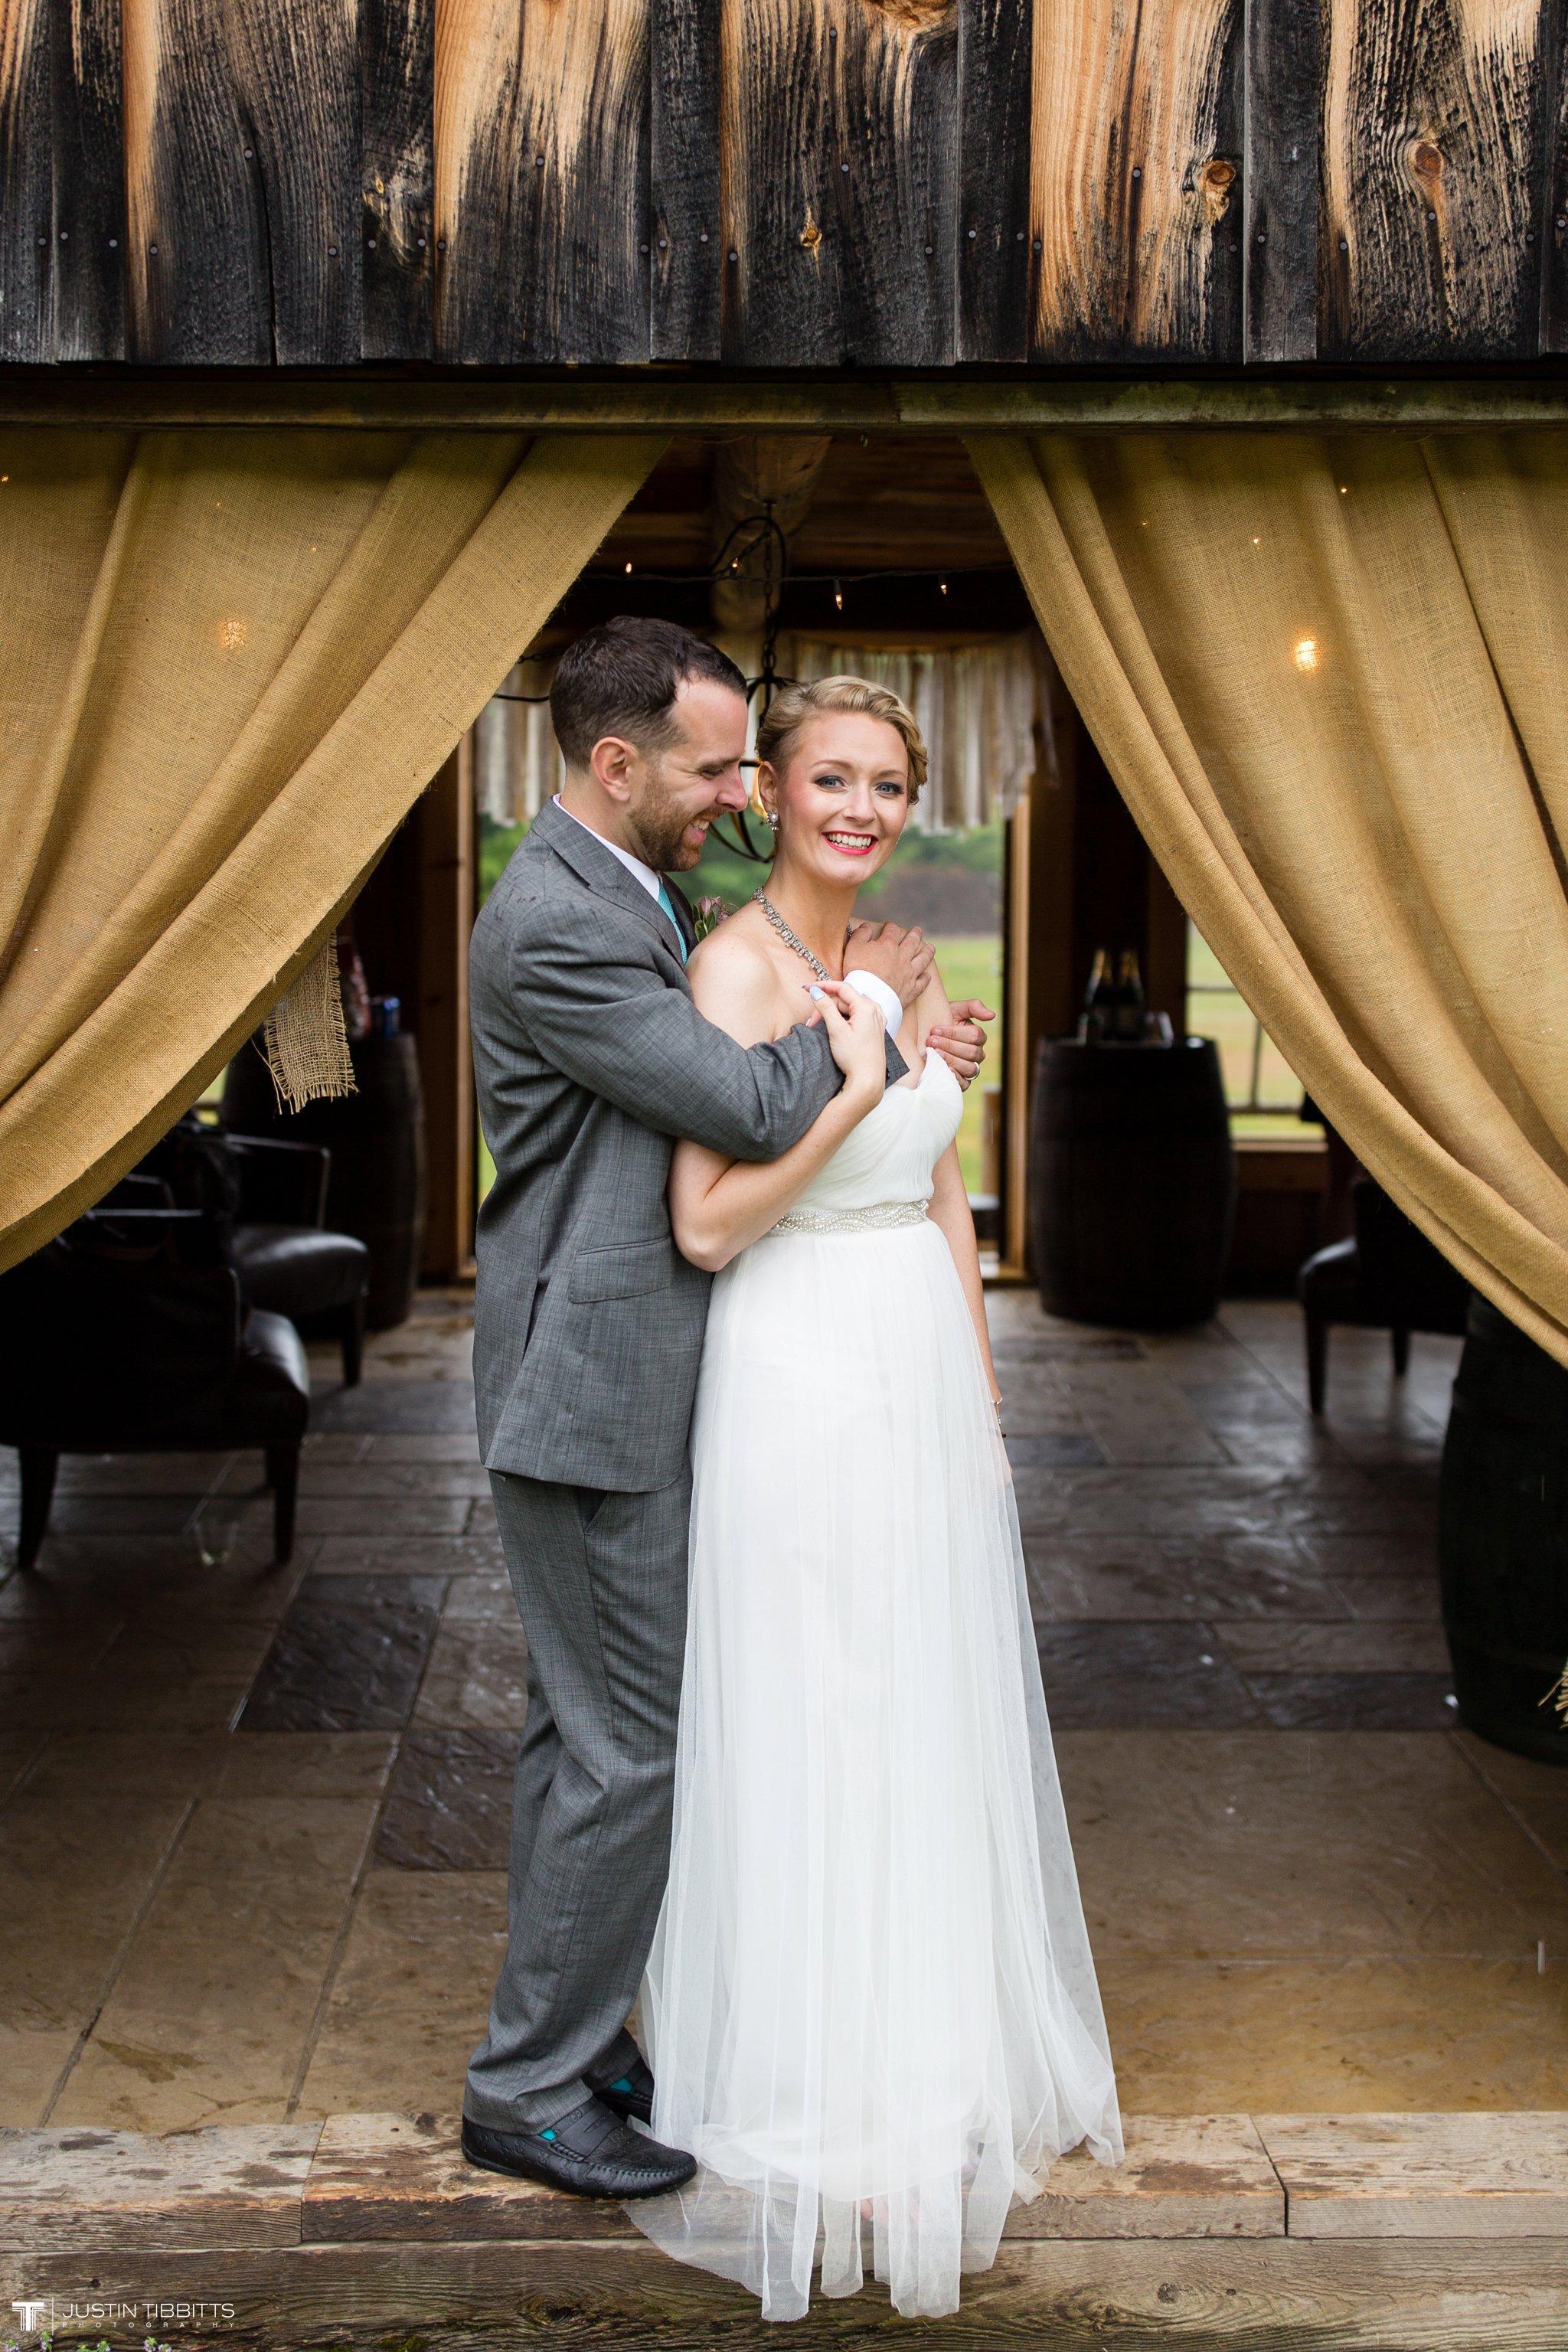 burlap-and-beams-wedding-photos-with-joran-and-molly_0090